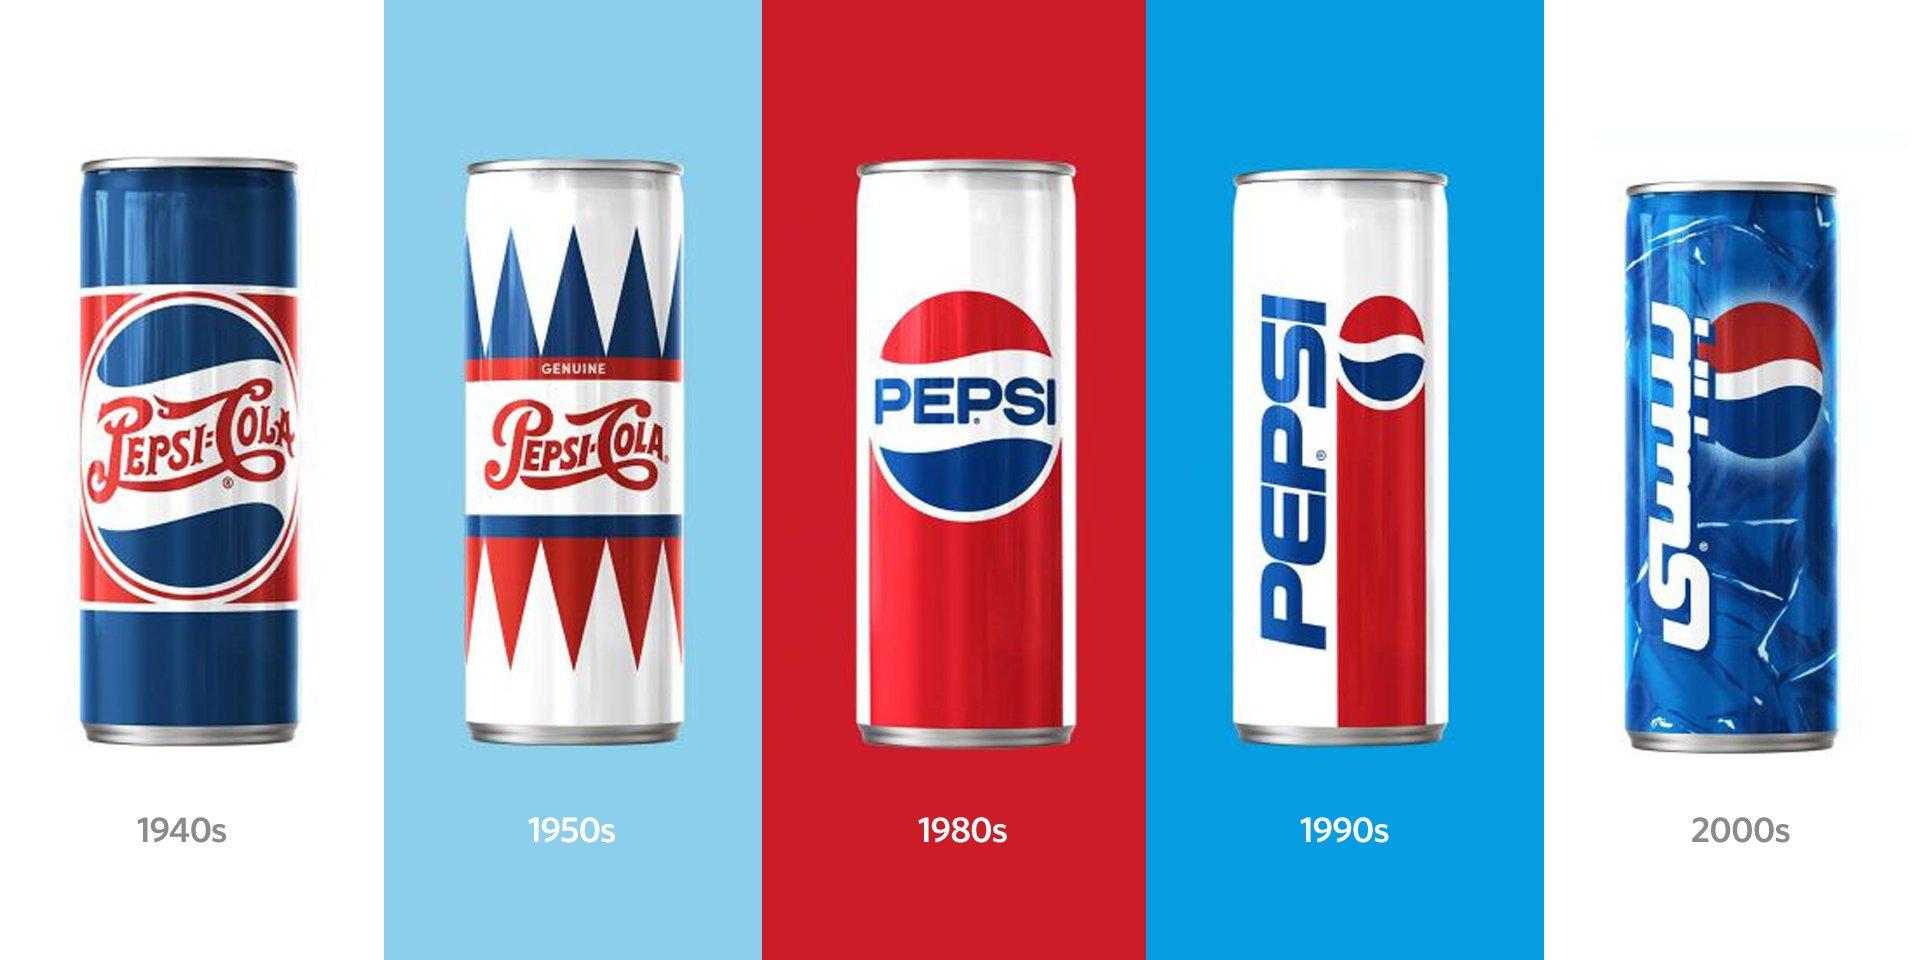 Pepsi Nostalgia branding